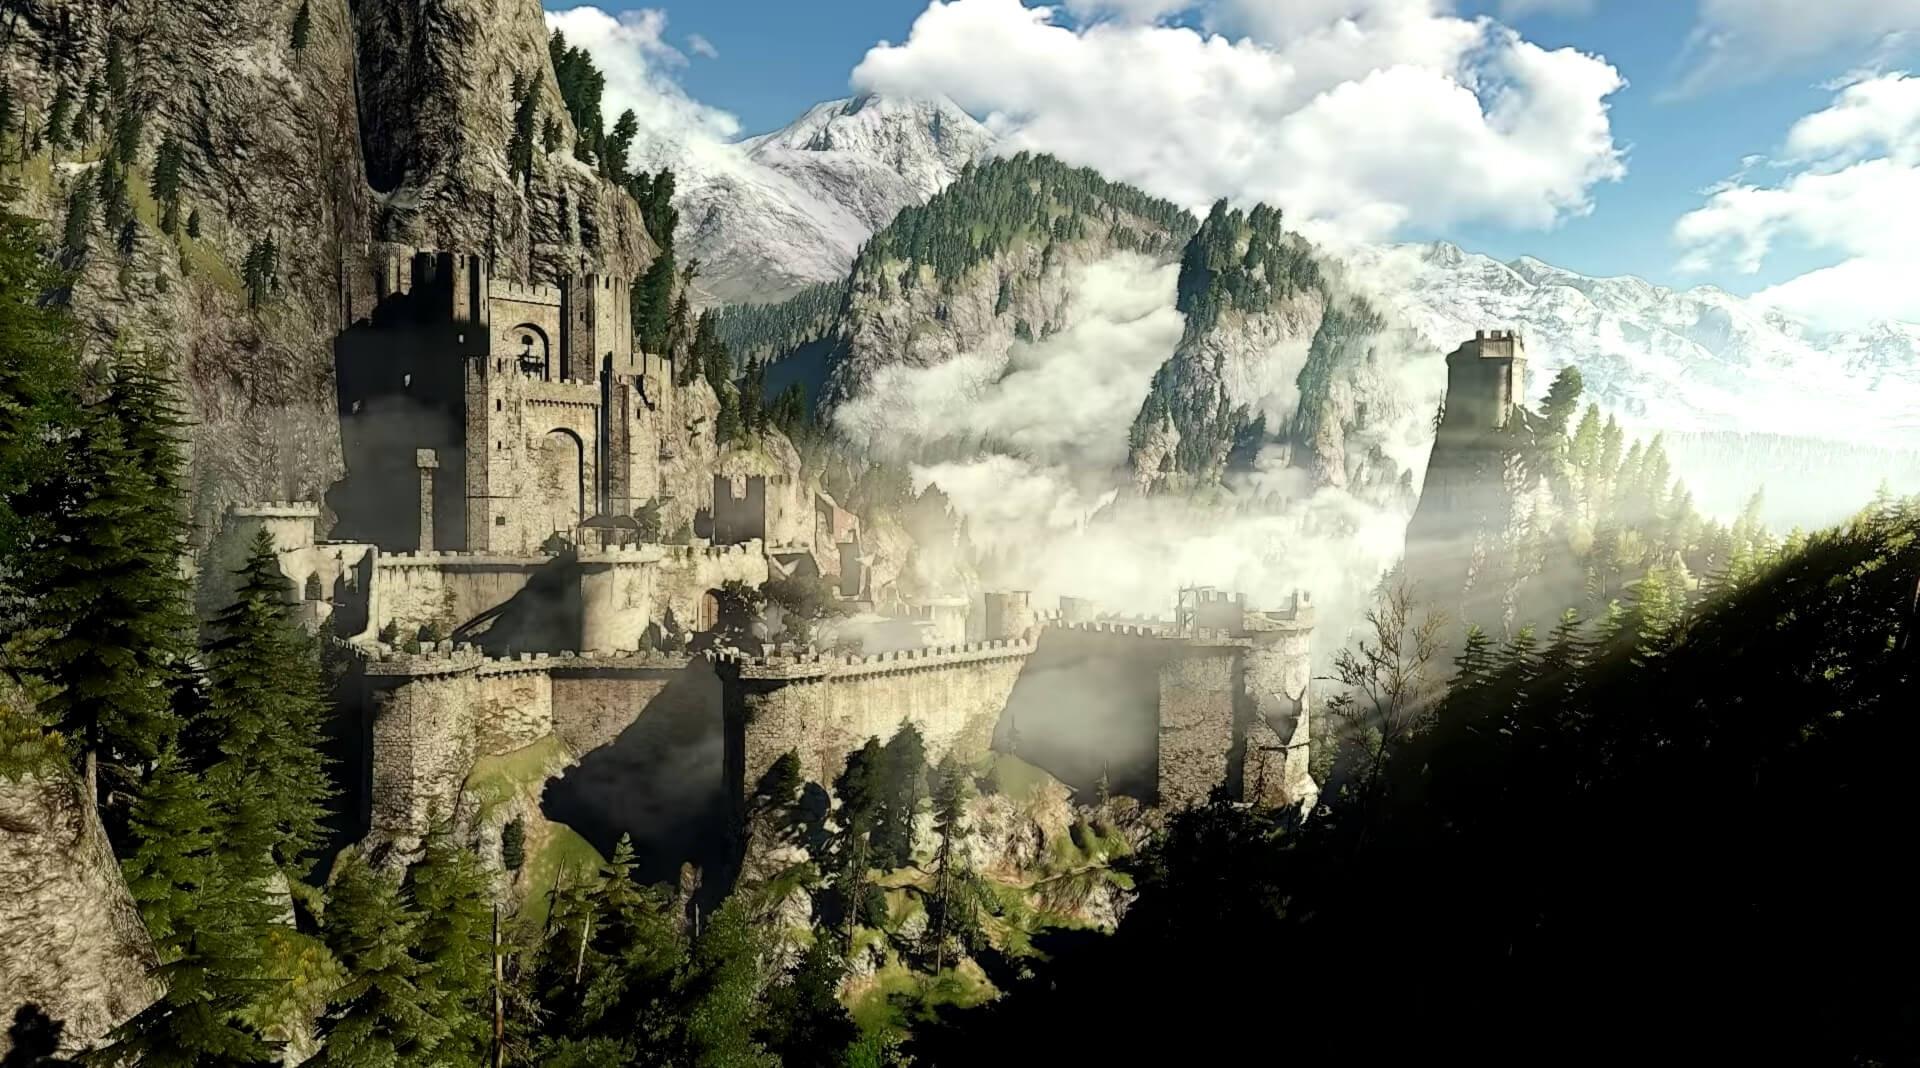 Geralt of Rivia - Kaer Morhen